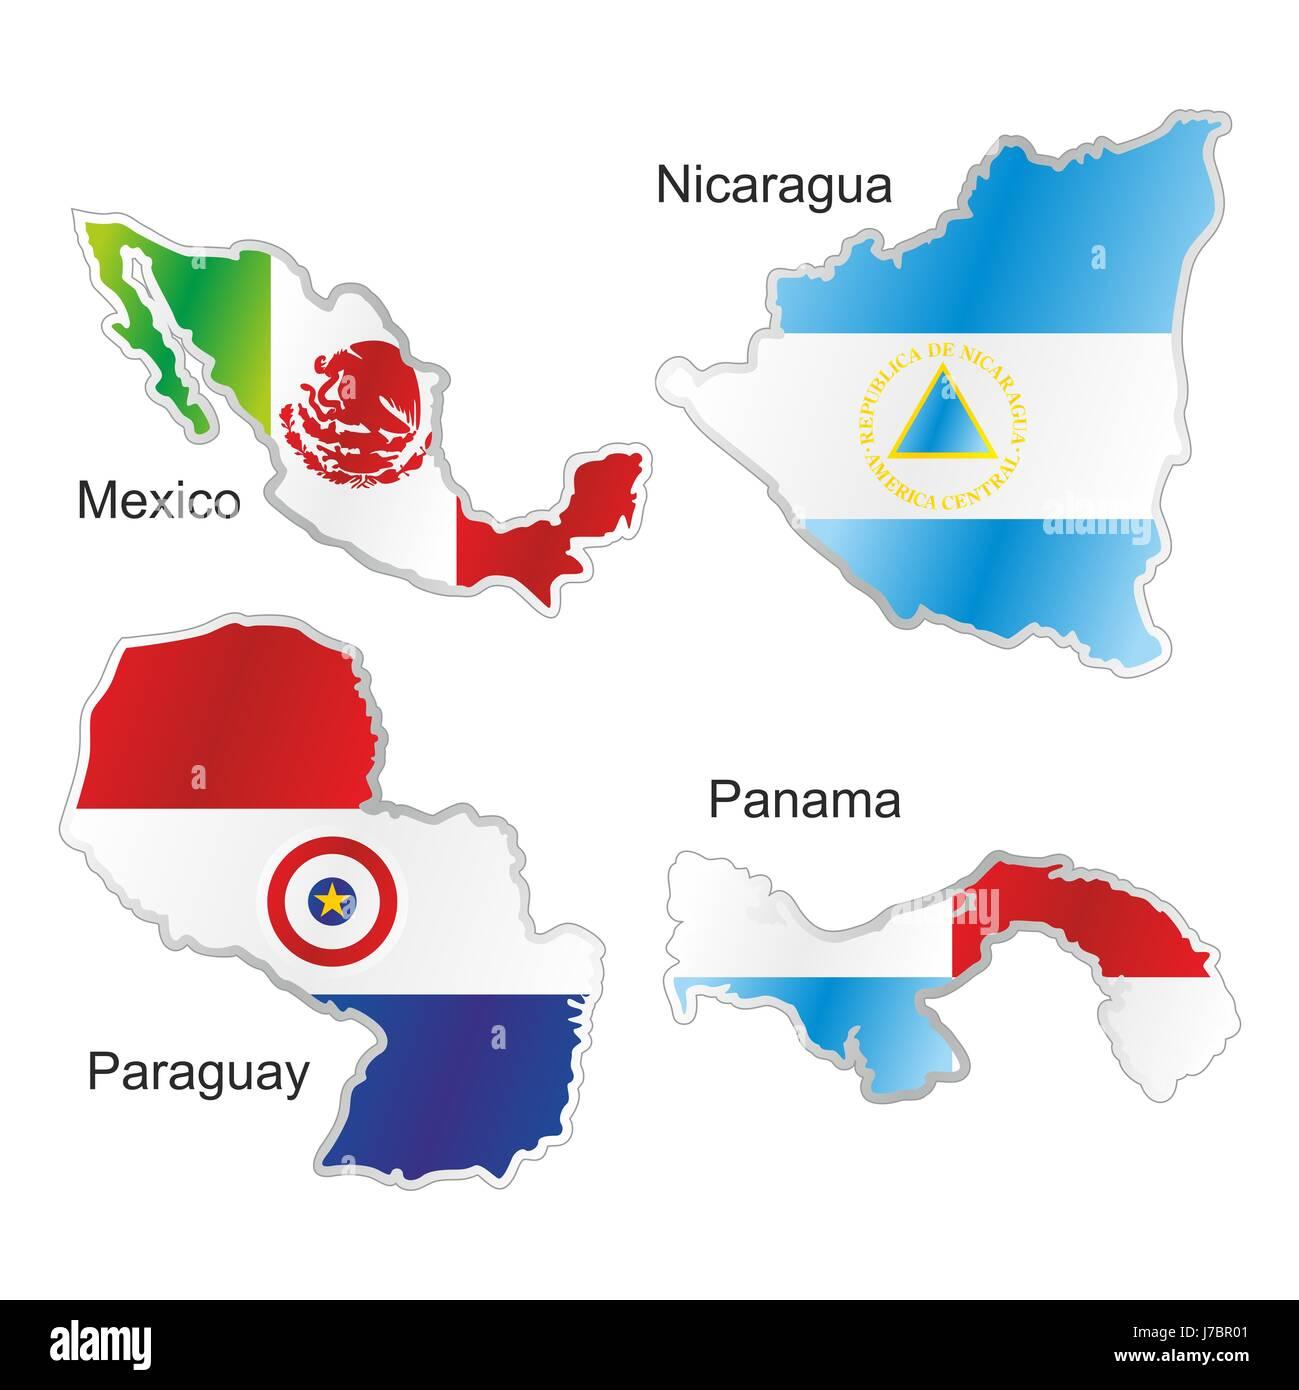 Mexiko Karte Welt.Amerika Fahne Paraguay Panama Landkarte Nicaragua Atlas